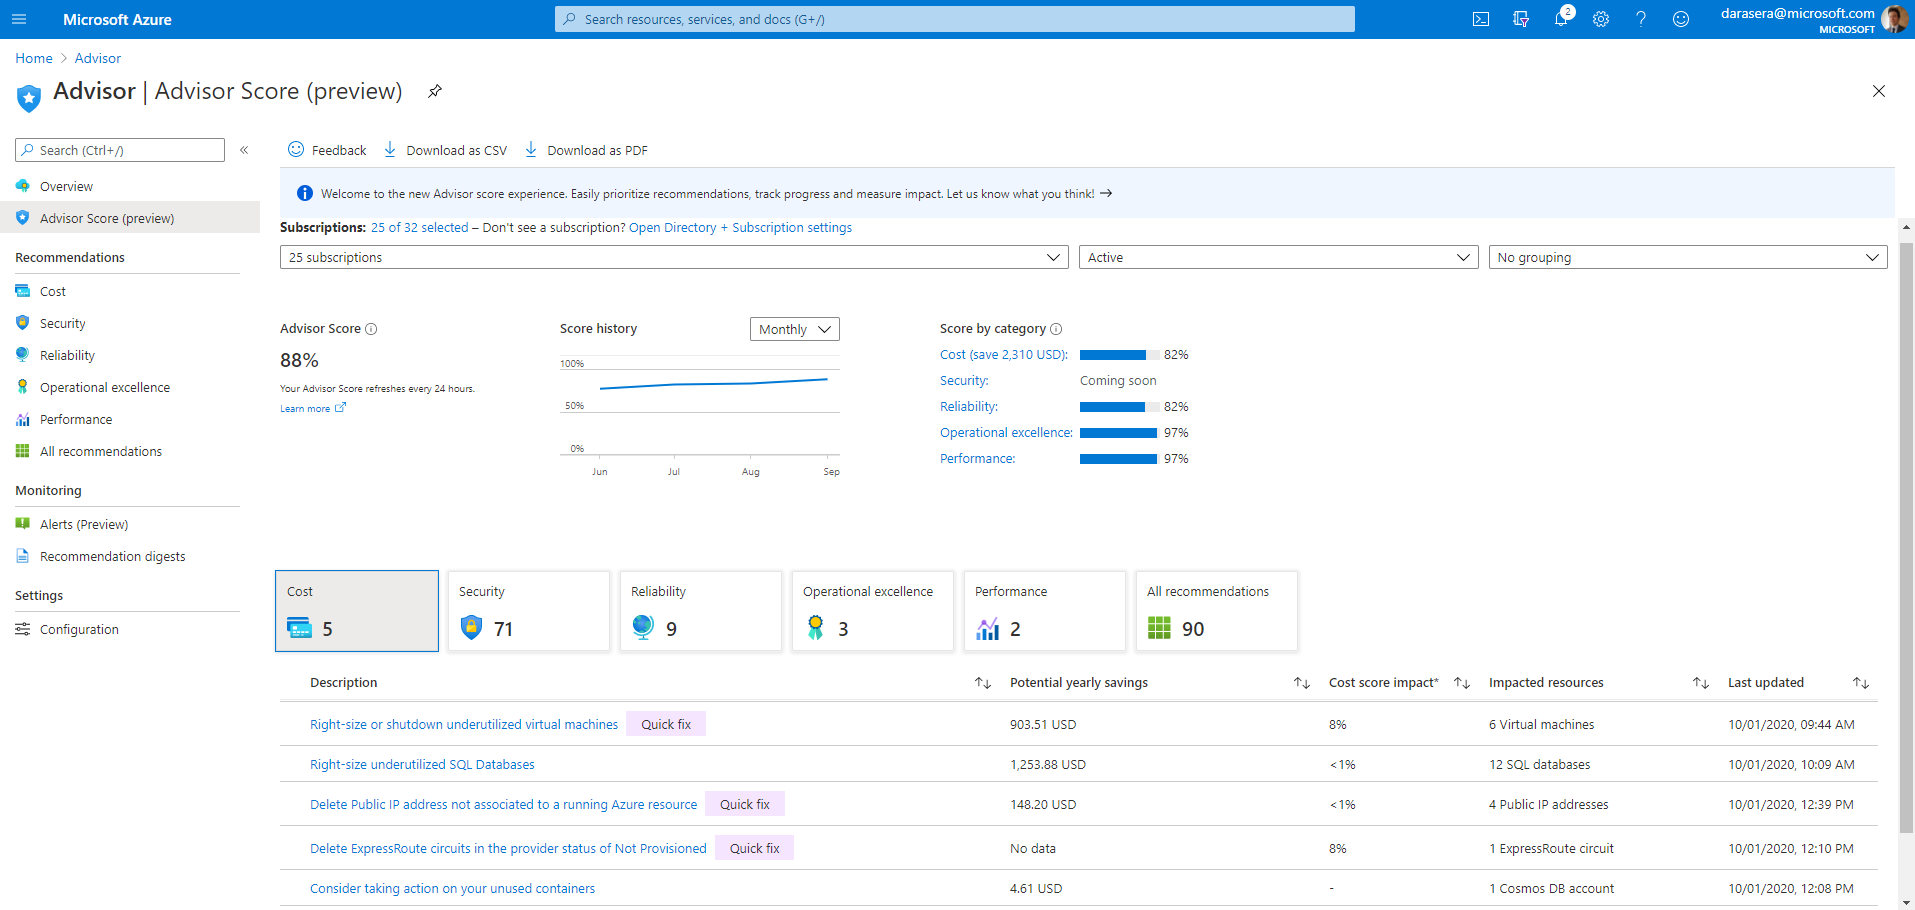 Azure portal における Azure Advisor スコアのエクスペリエンスのスクリーンショット